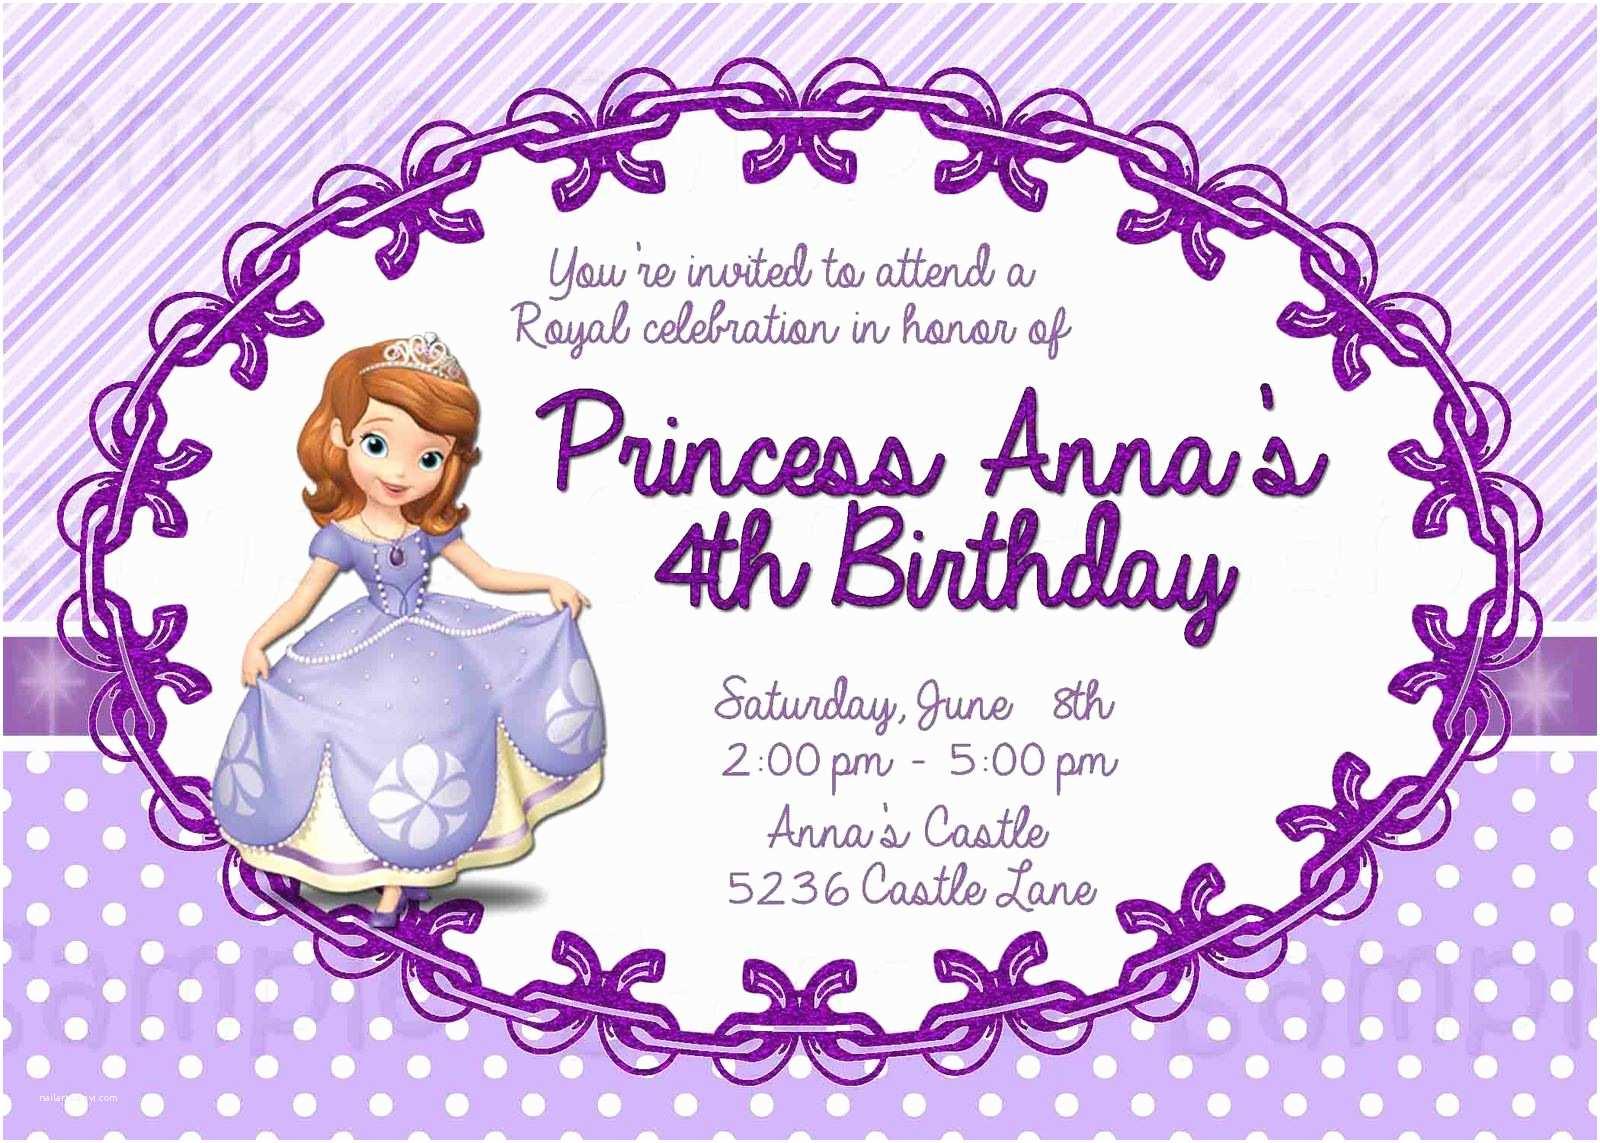 Customized Birthday Invitations sofia the First Personalized Birthday Invitations